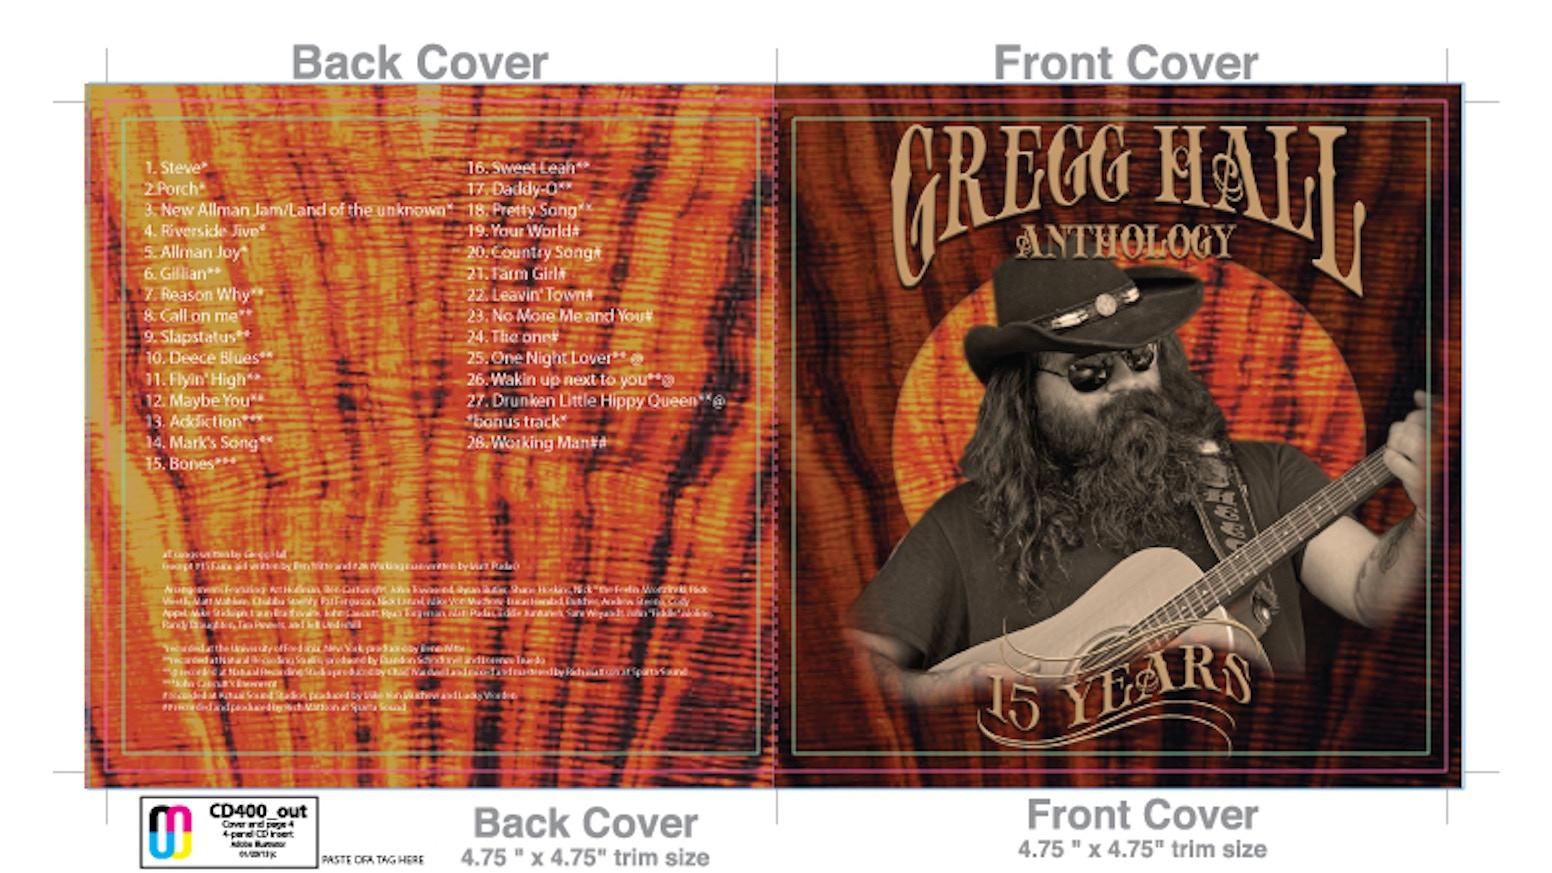 Gregg Hall Anthology By Gregg Hall Kickstarter